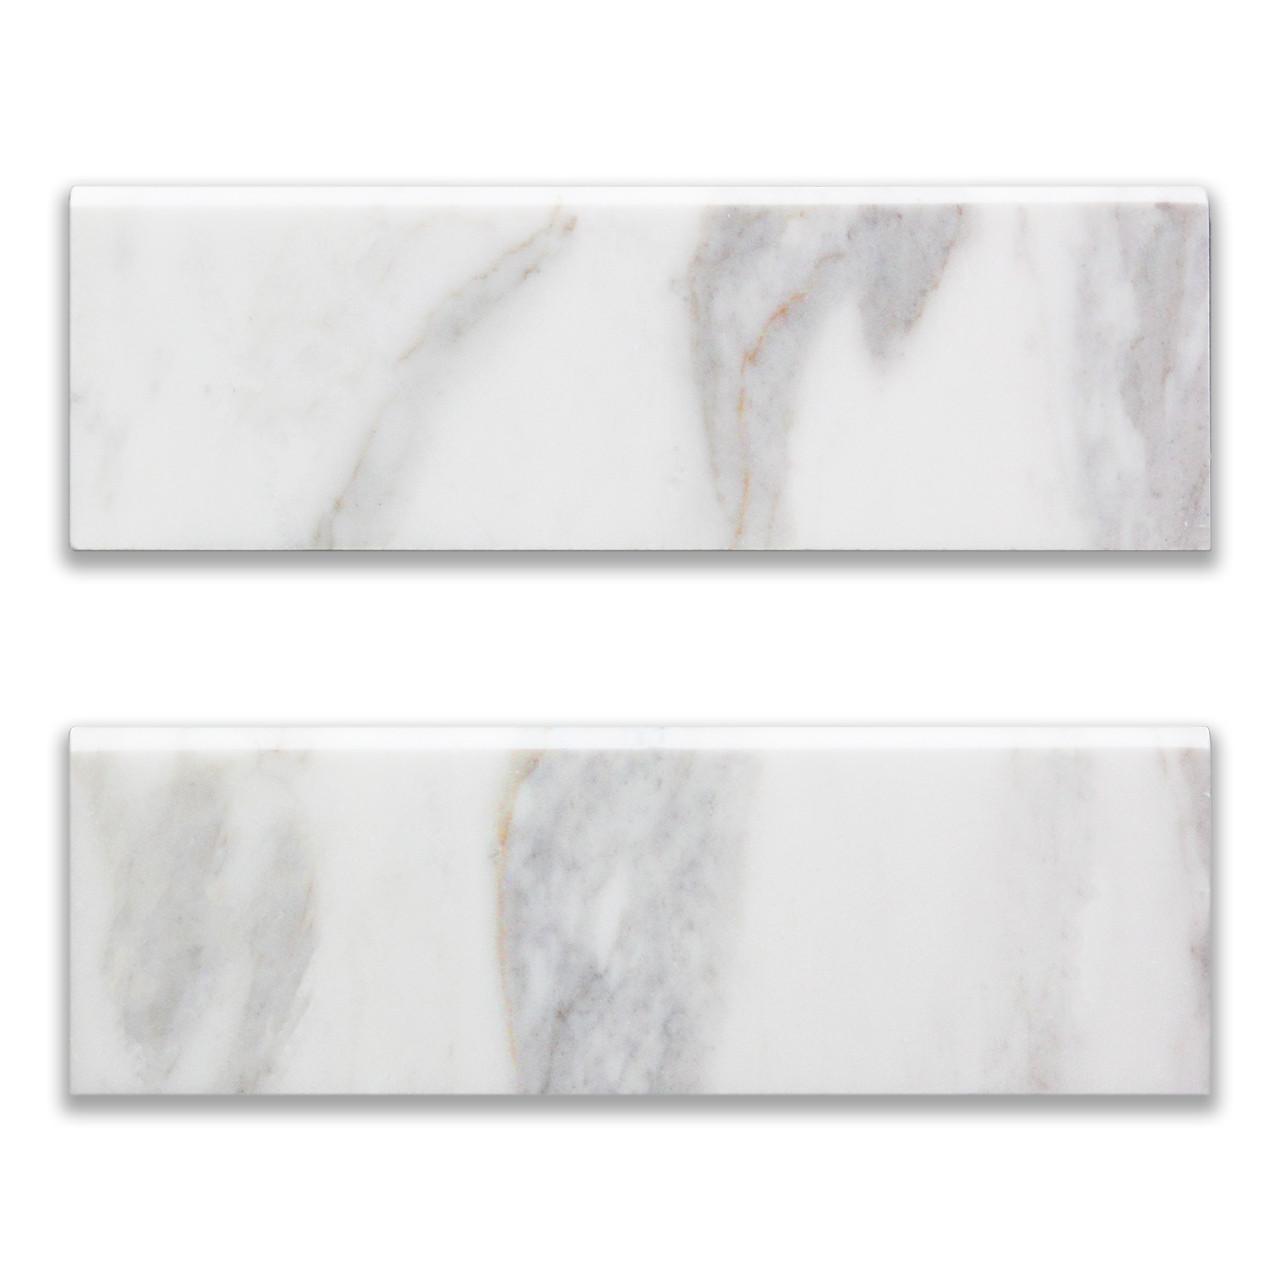 4x12 calacatta gold italian marble bullnose trim tile honed